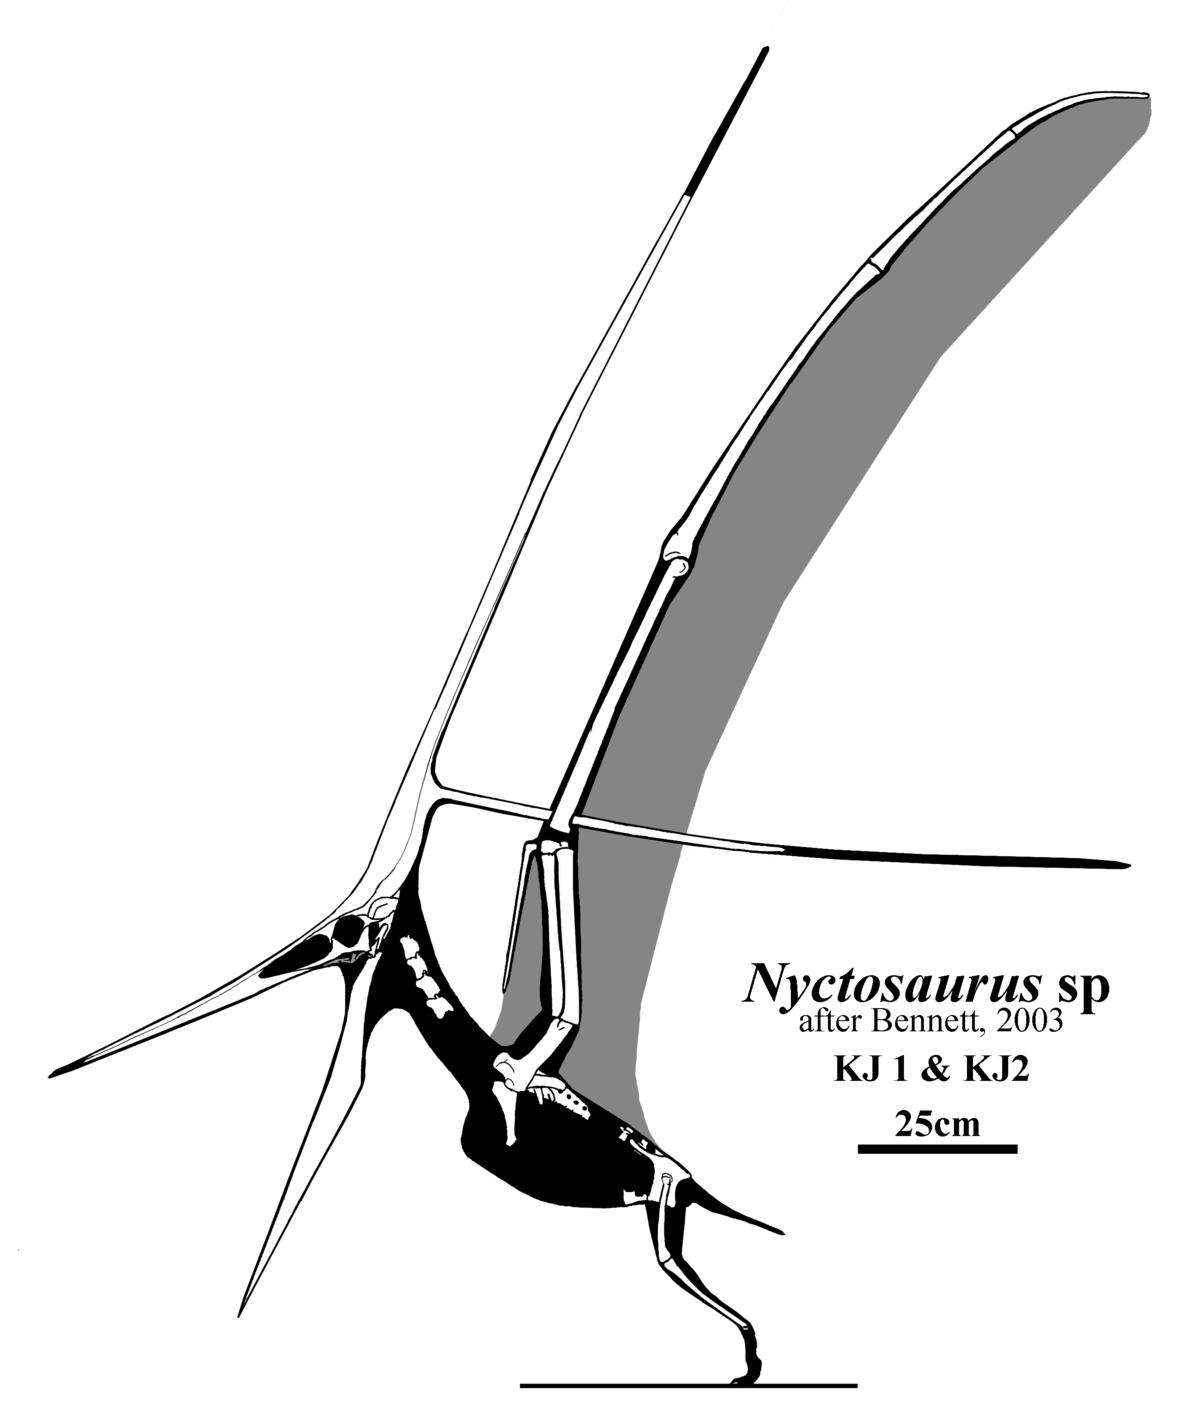 nyctosauridae wikipedia